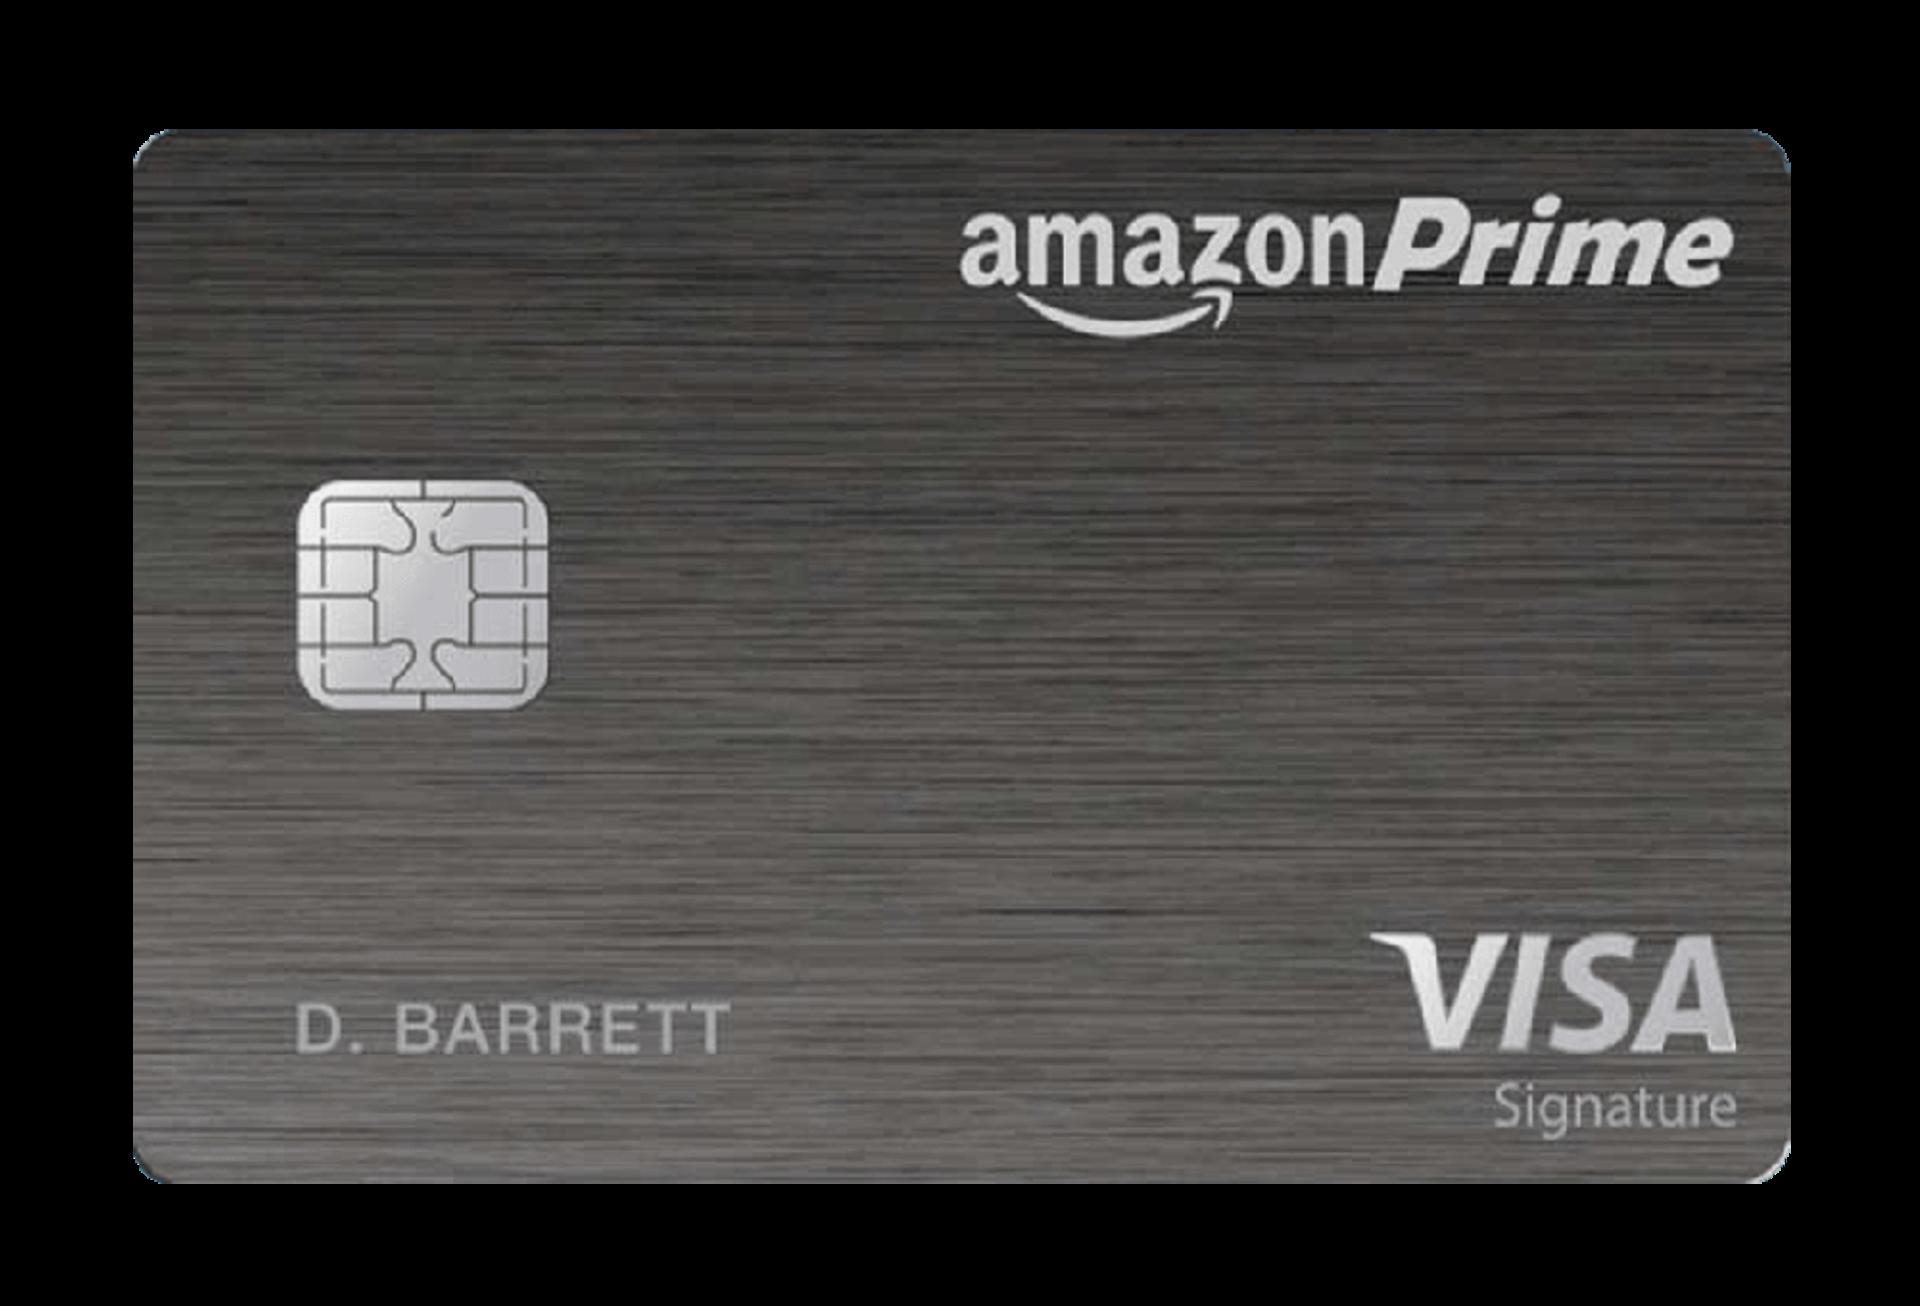 Amazon Prime Rewards Visa Signature Card Managed by Tally.